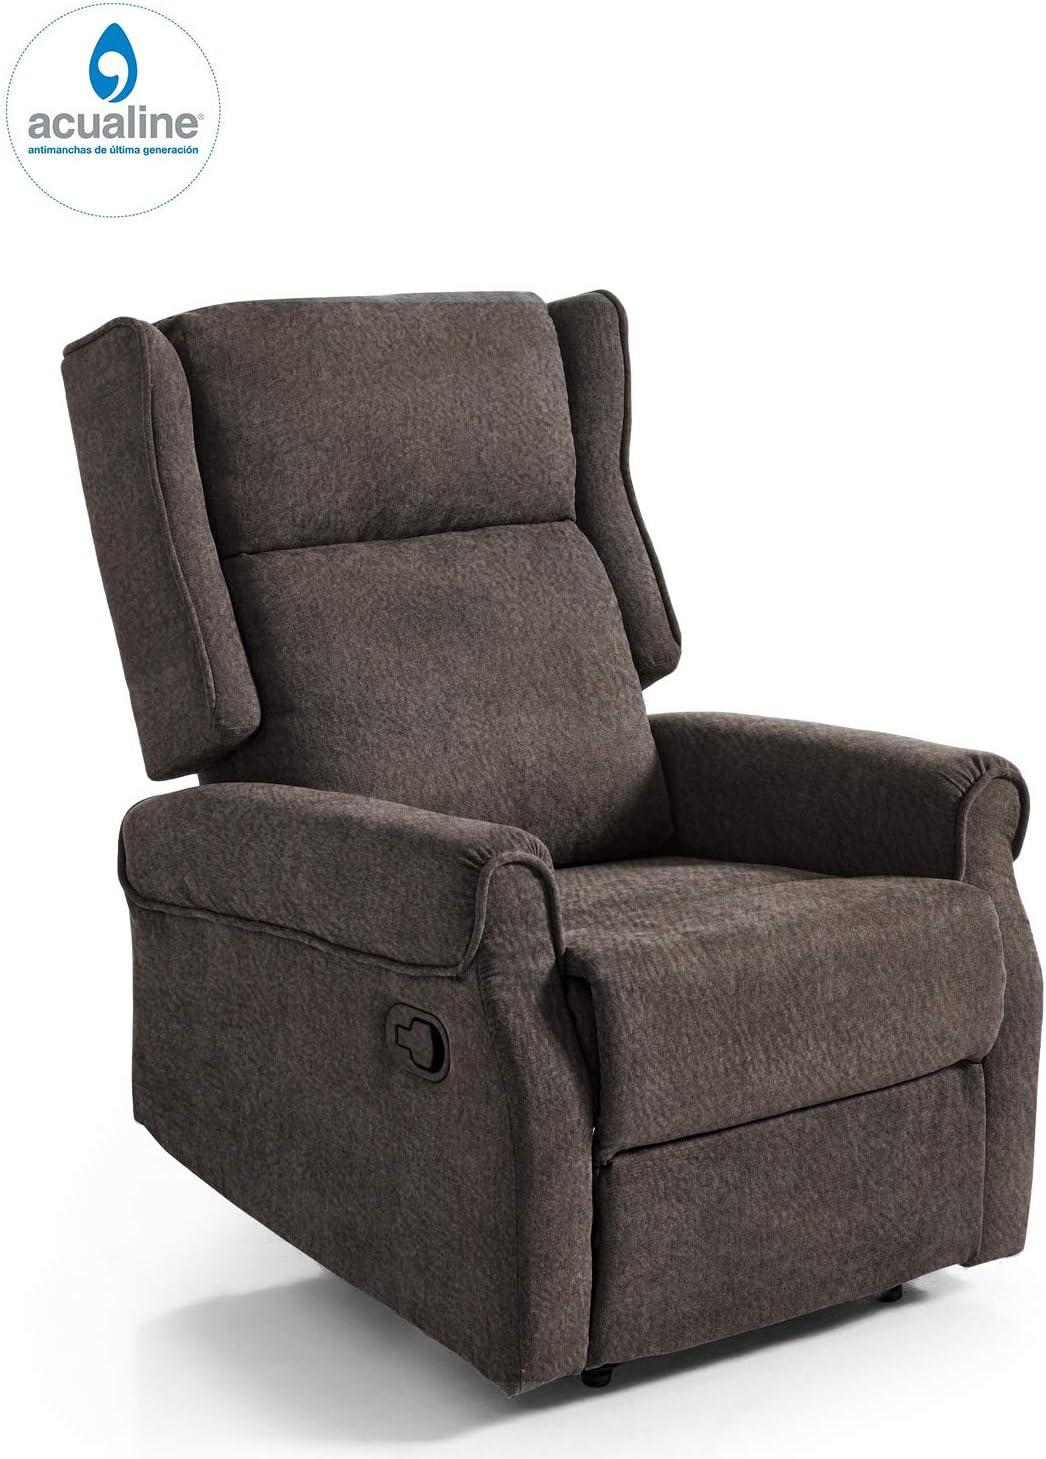 Butaca Relax British, tapizado aquaclean, Tela Antimanchas Gama Alta, sillón orejero reclinable con reposapies marrón Chocolate